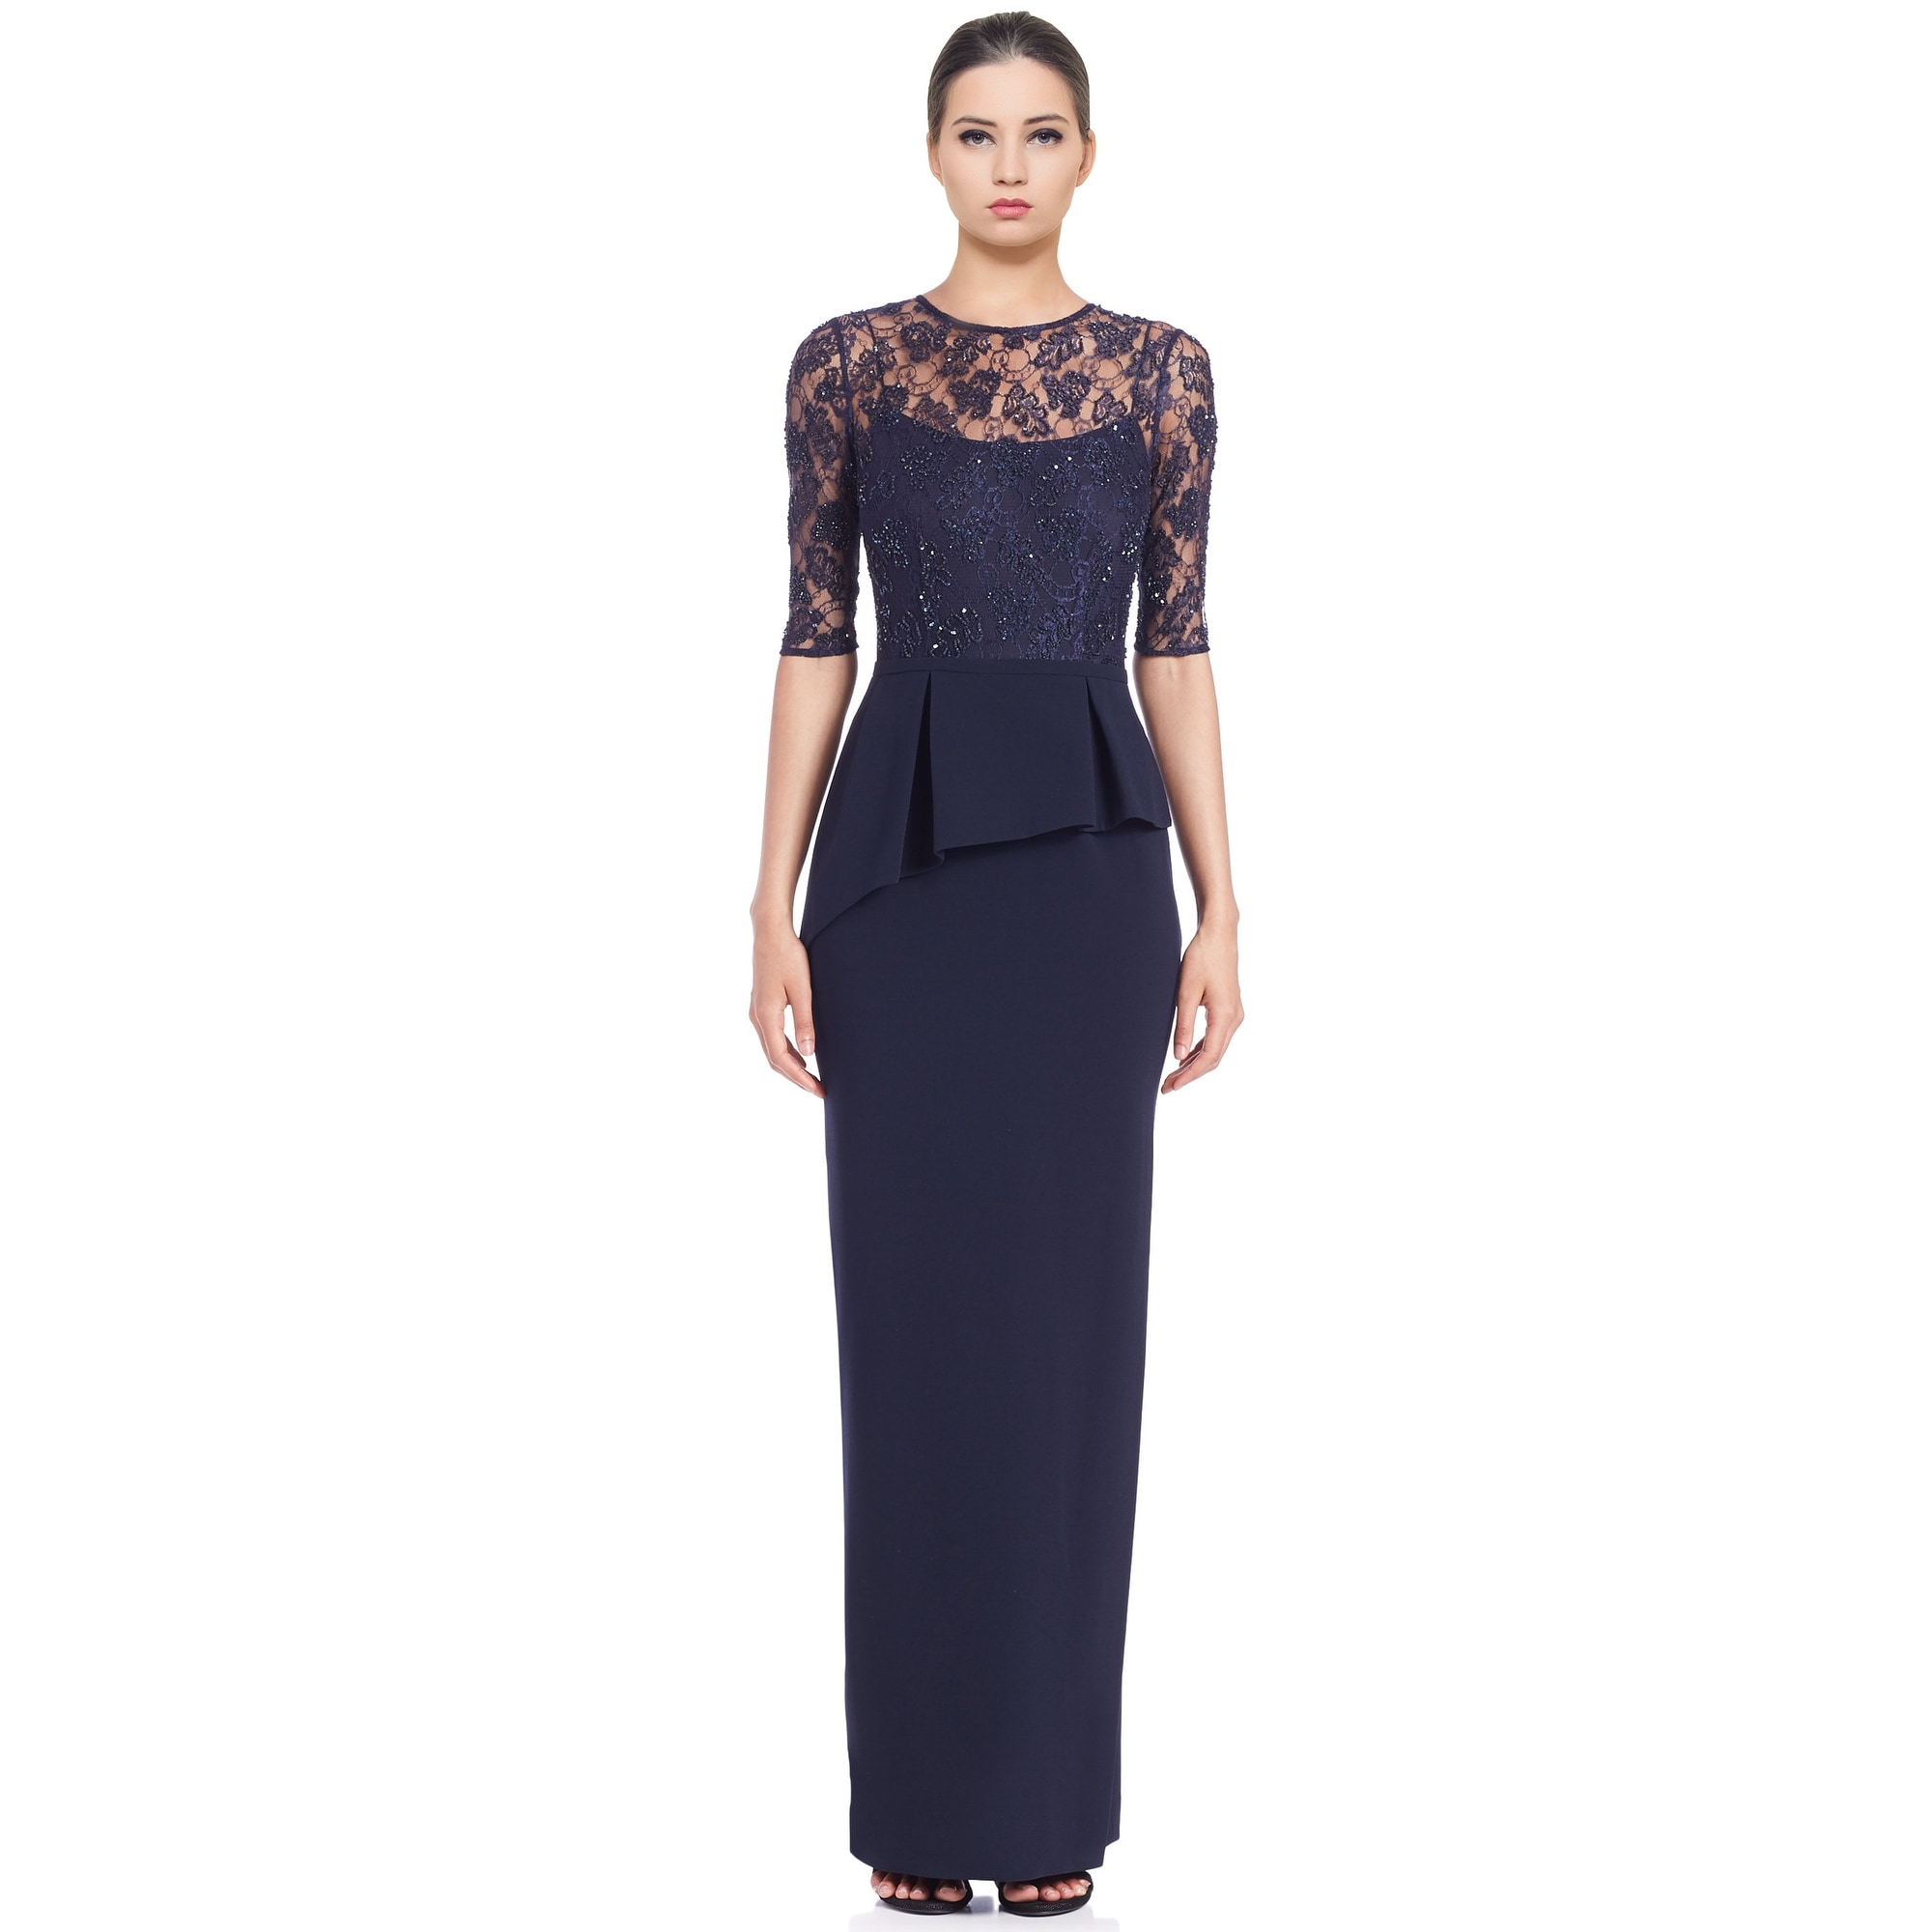 Shop Teri Jon Embellished Lace Peplum Column Evening Gown Dress ...